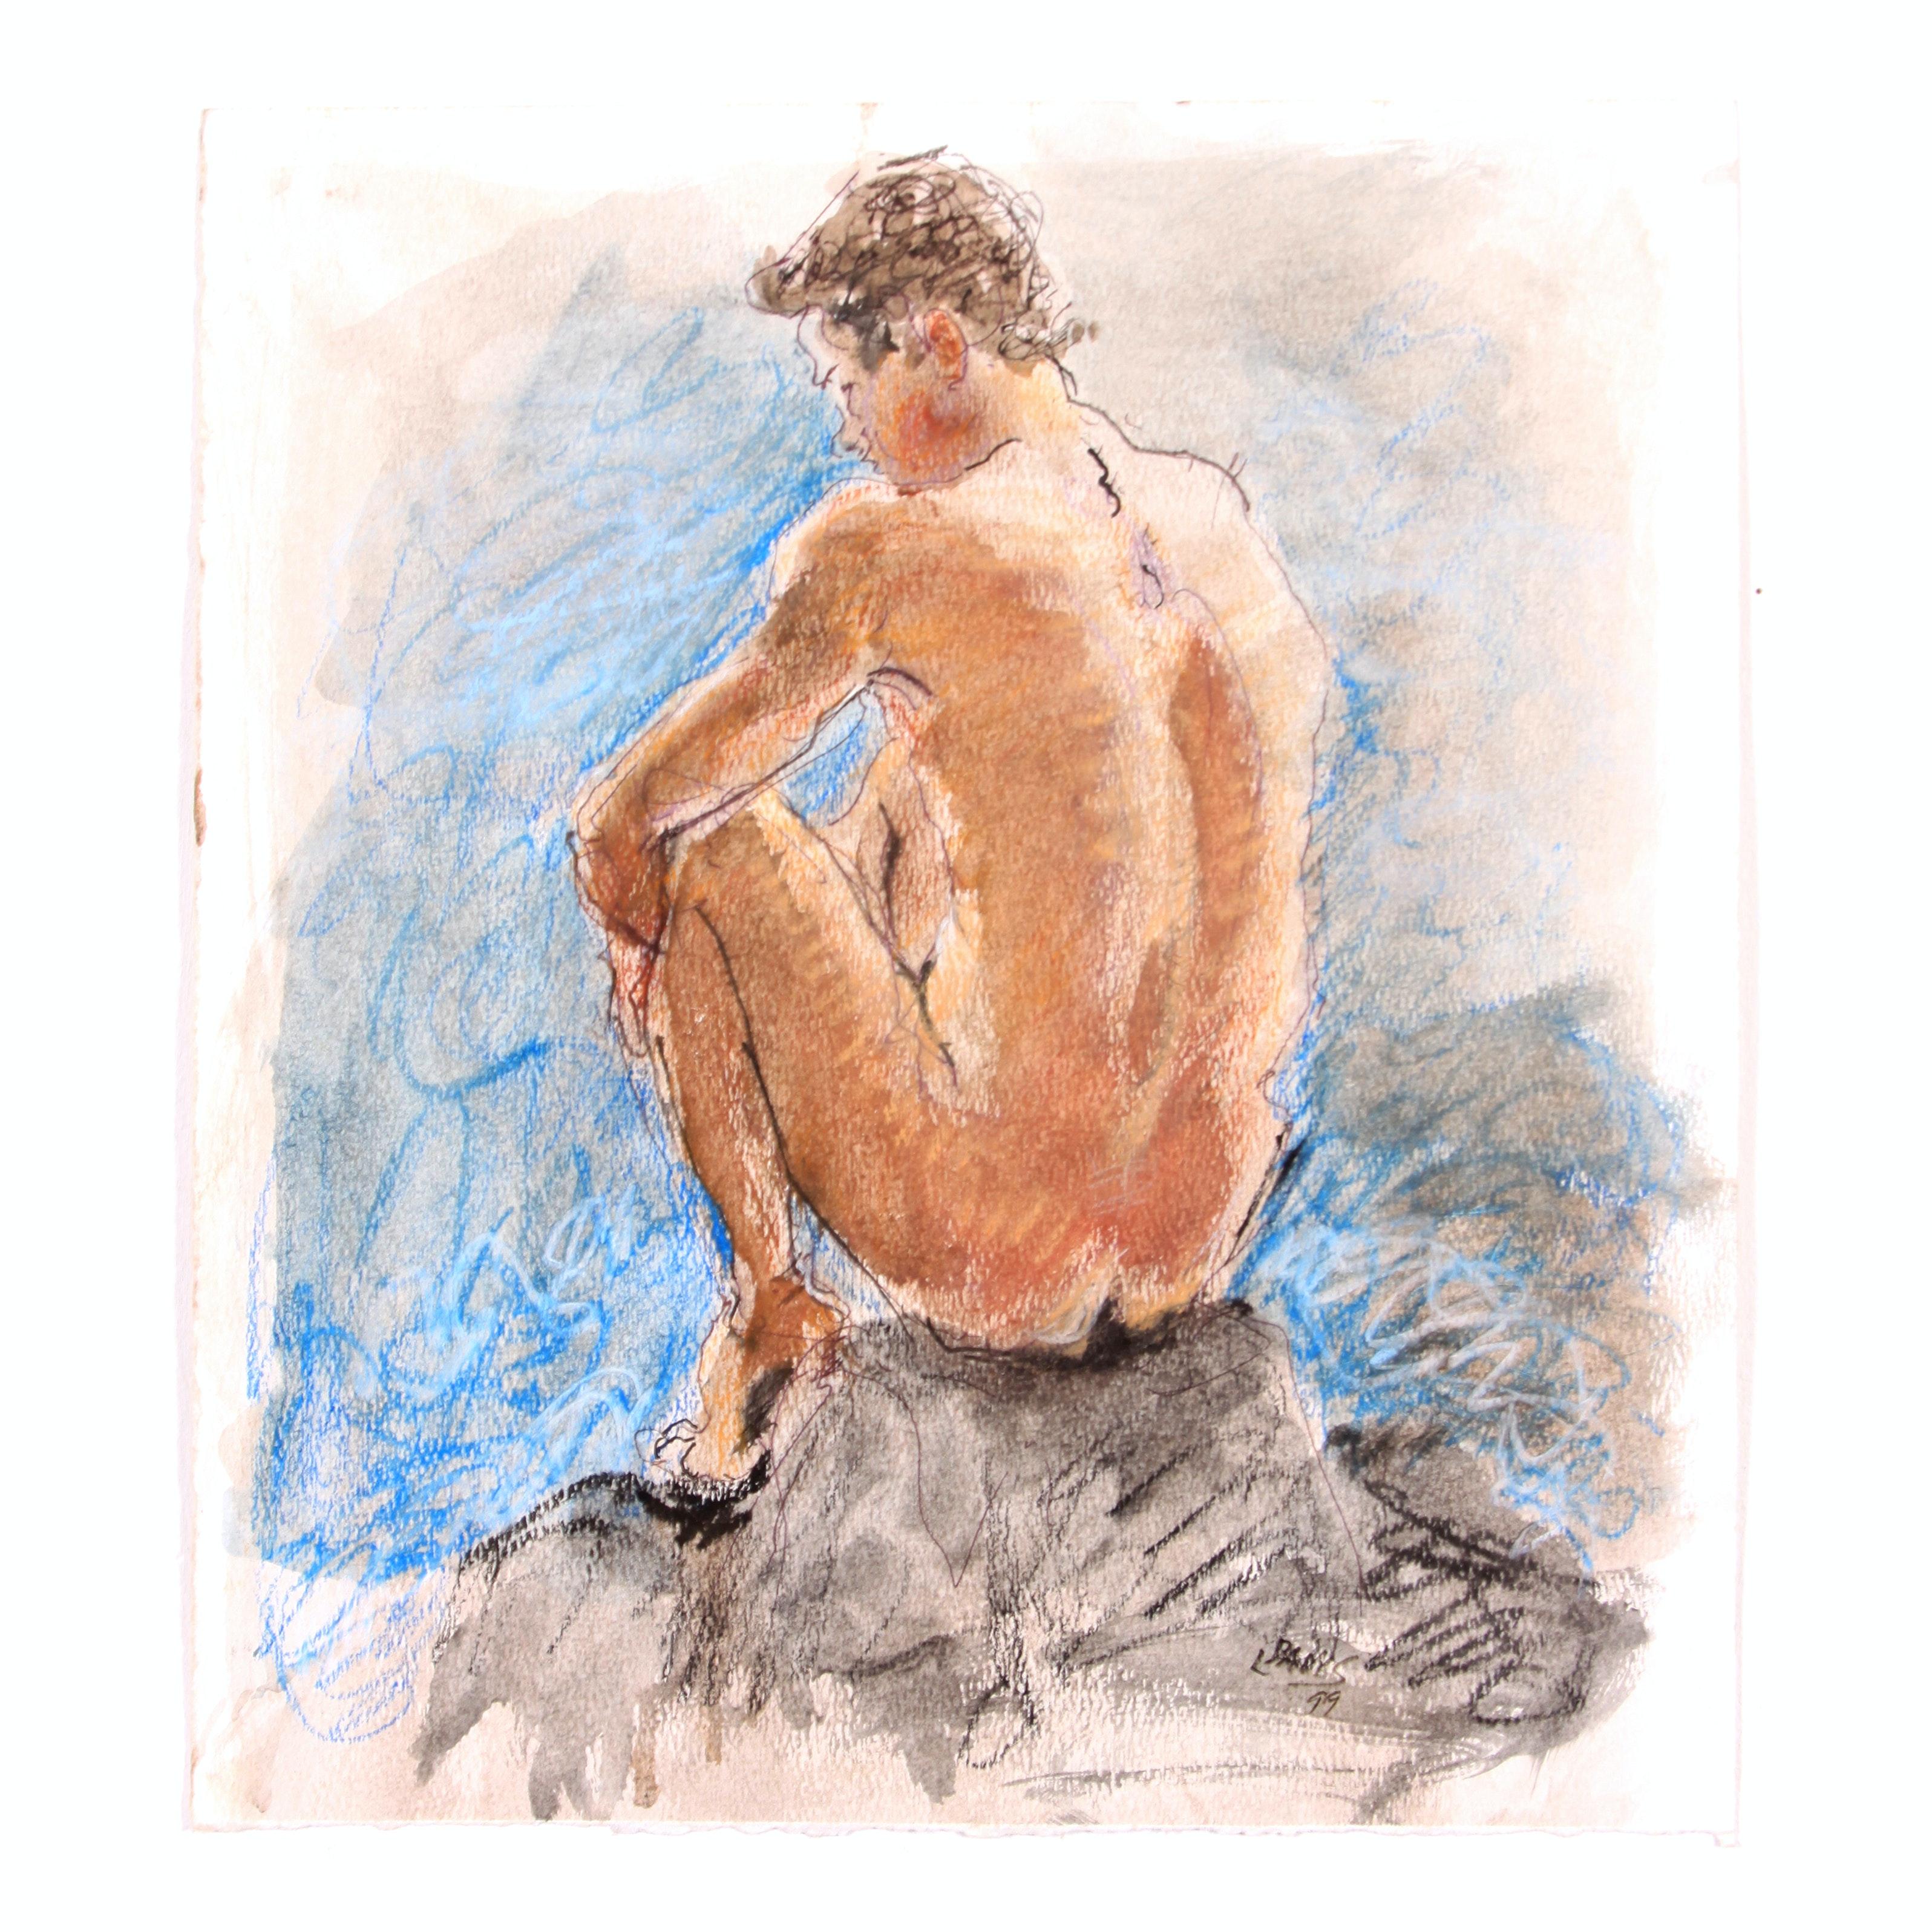 Original Double Sided Figure Study by Lois Davis